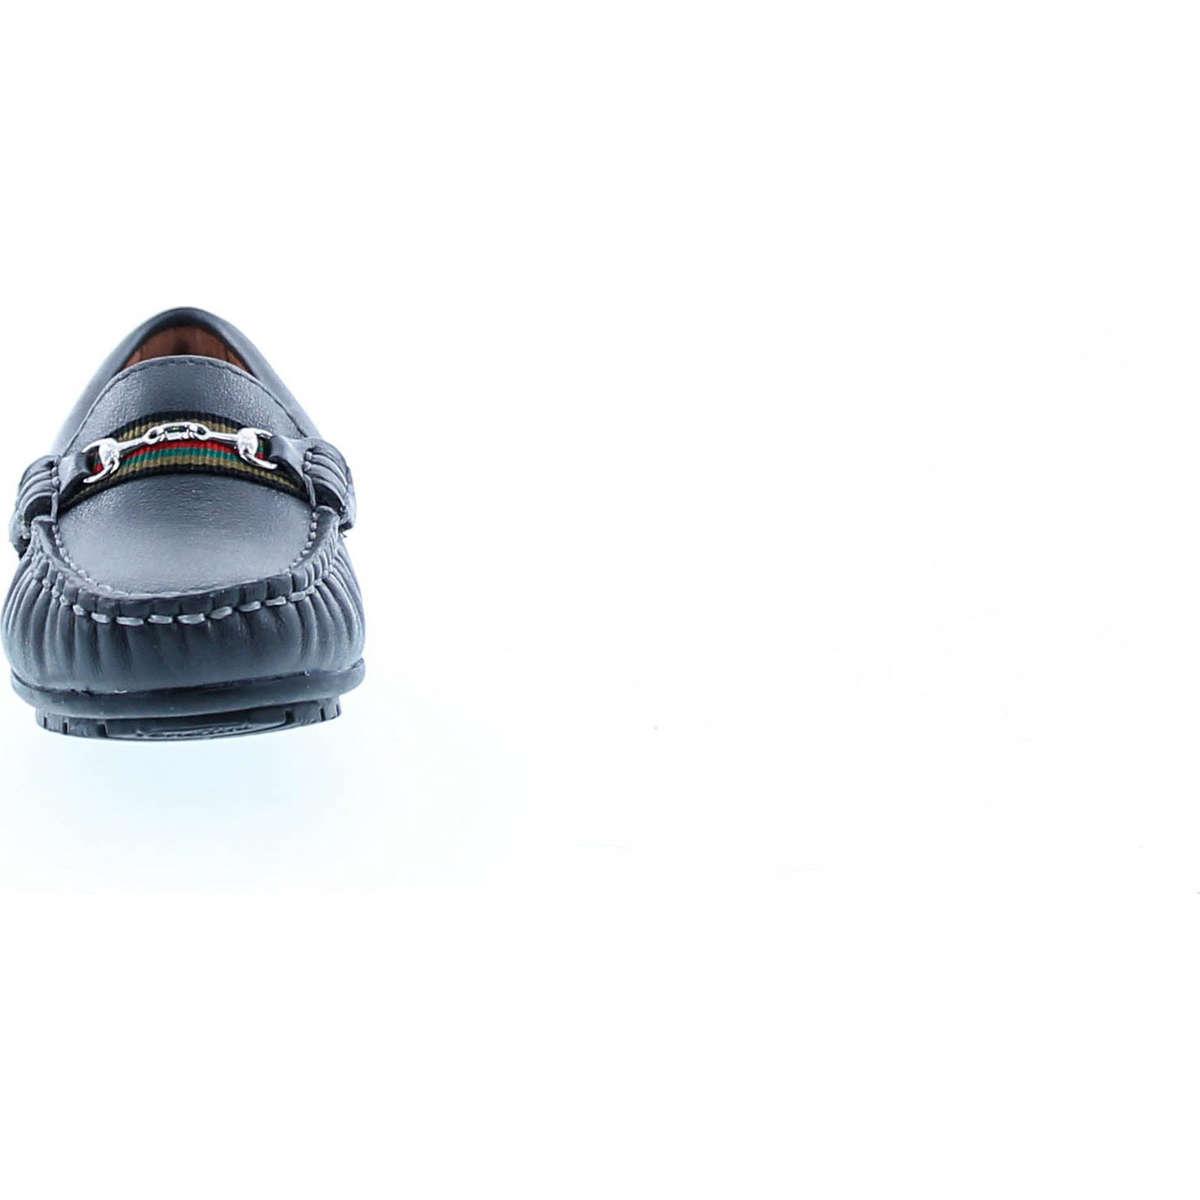 Venettini Boys 55-Toby Designer Buckle Slip On Casual Dress Loafers Shoes